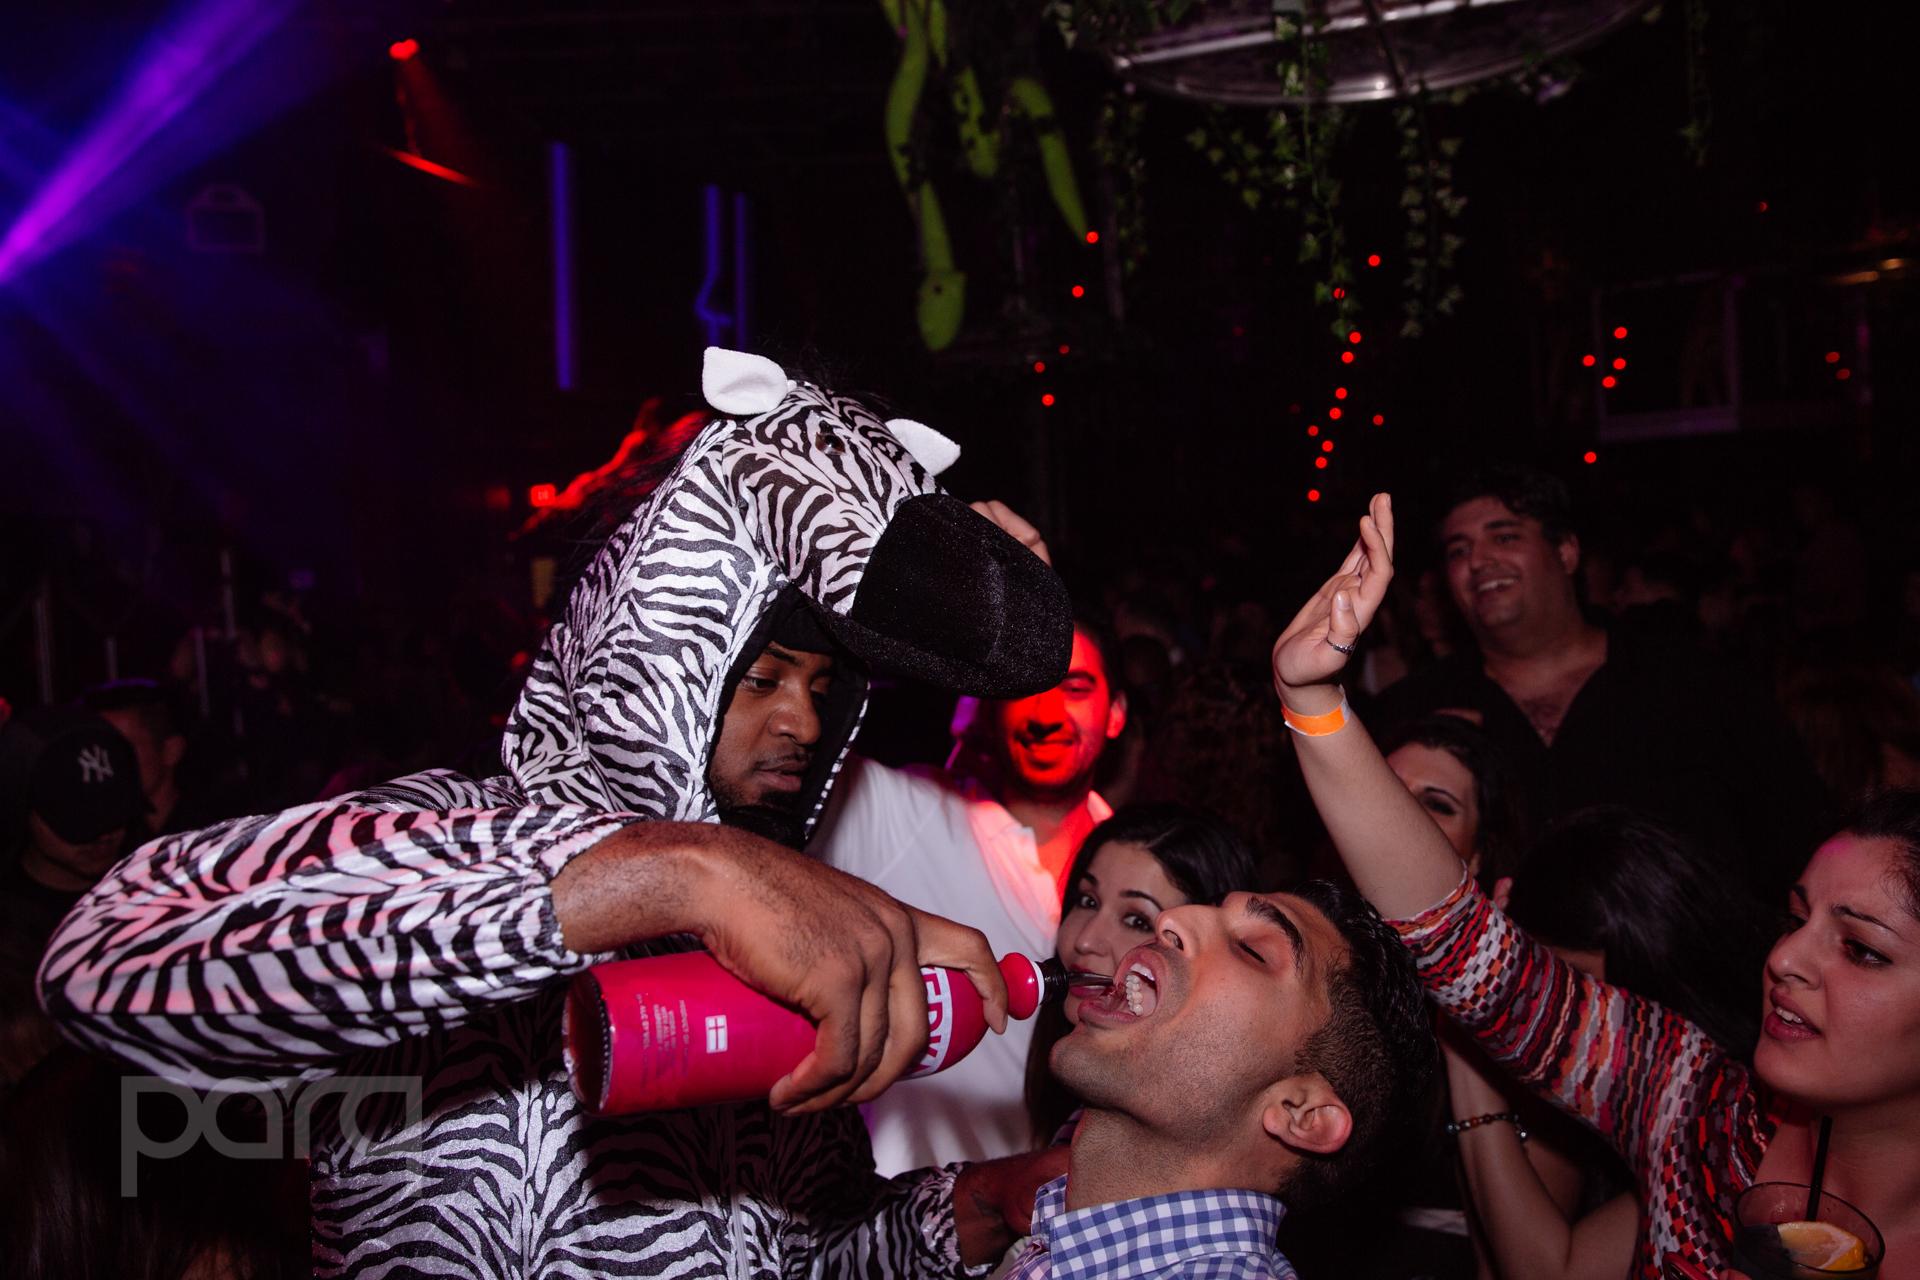 San-Diego-Nightclub-Zoo Funktion-20.jpg